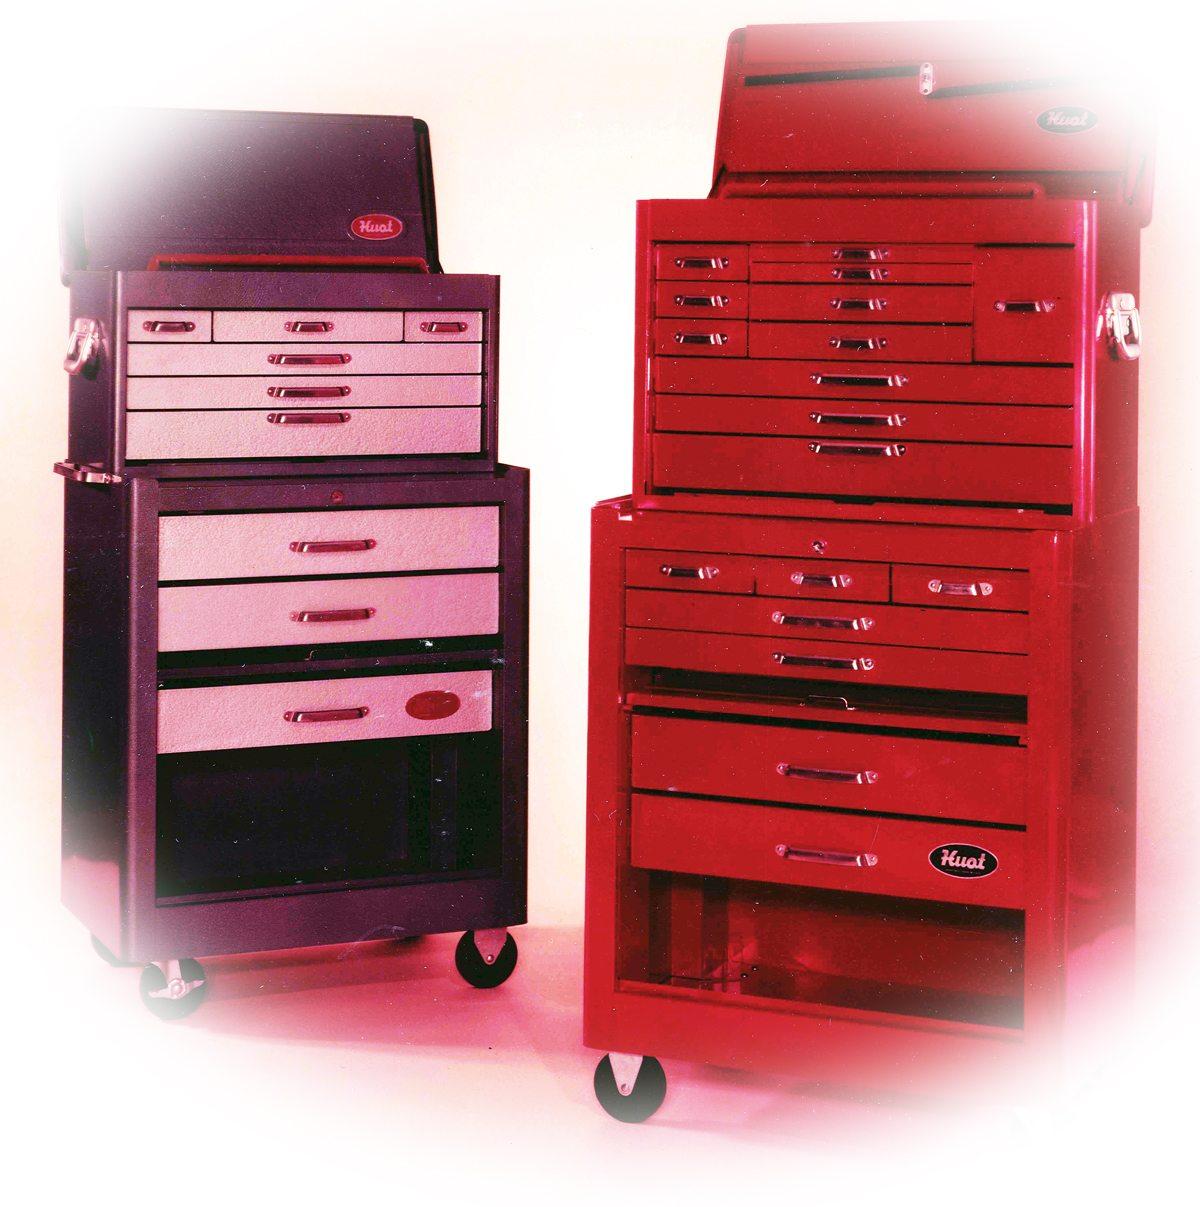 Old-Huot-tool-box